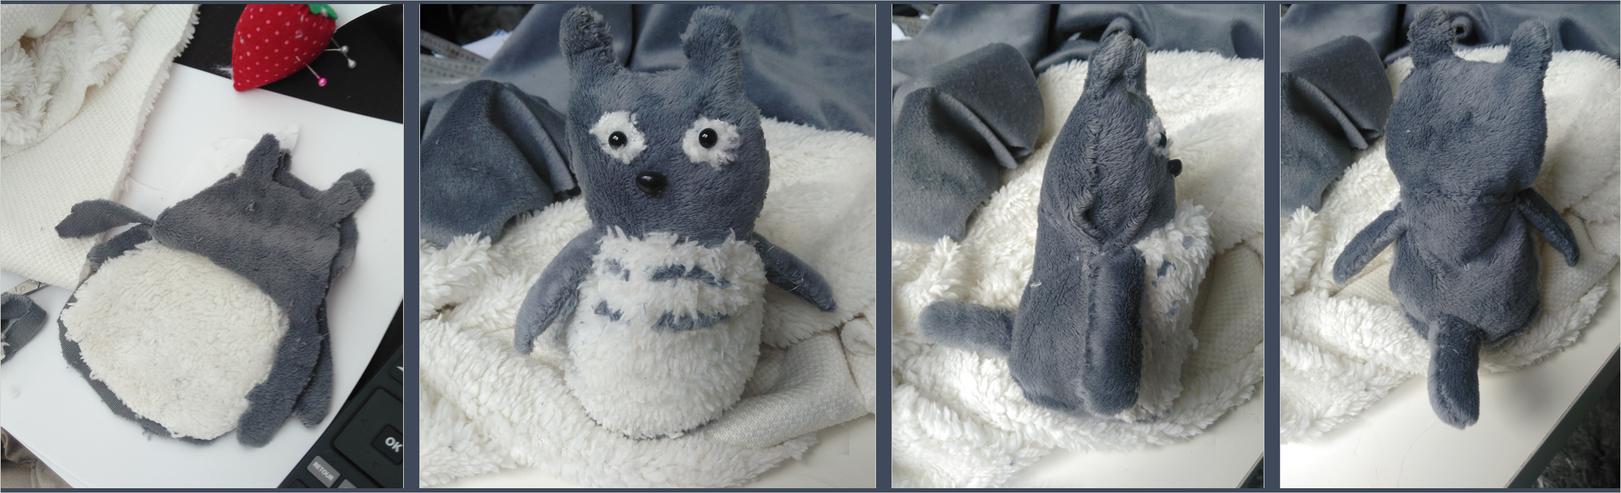 Les peluches Totoro_plush_by_liminki-da5fqh1